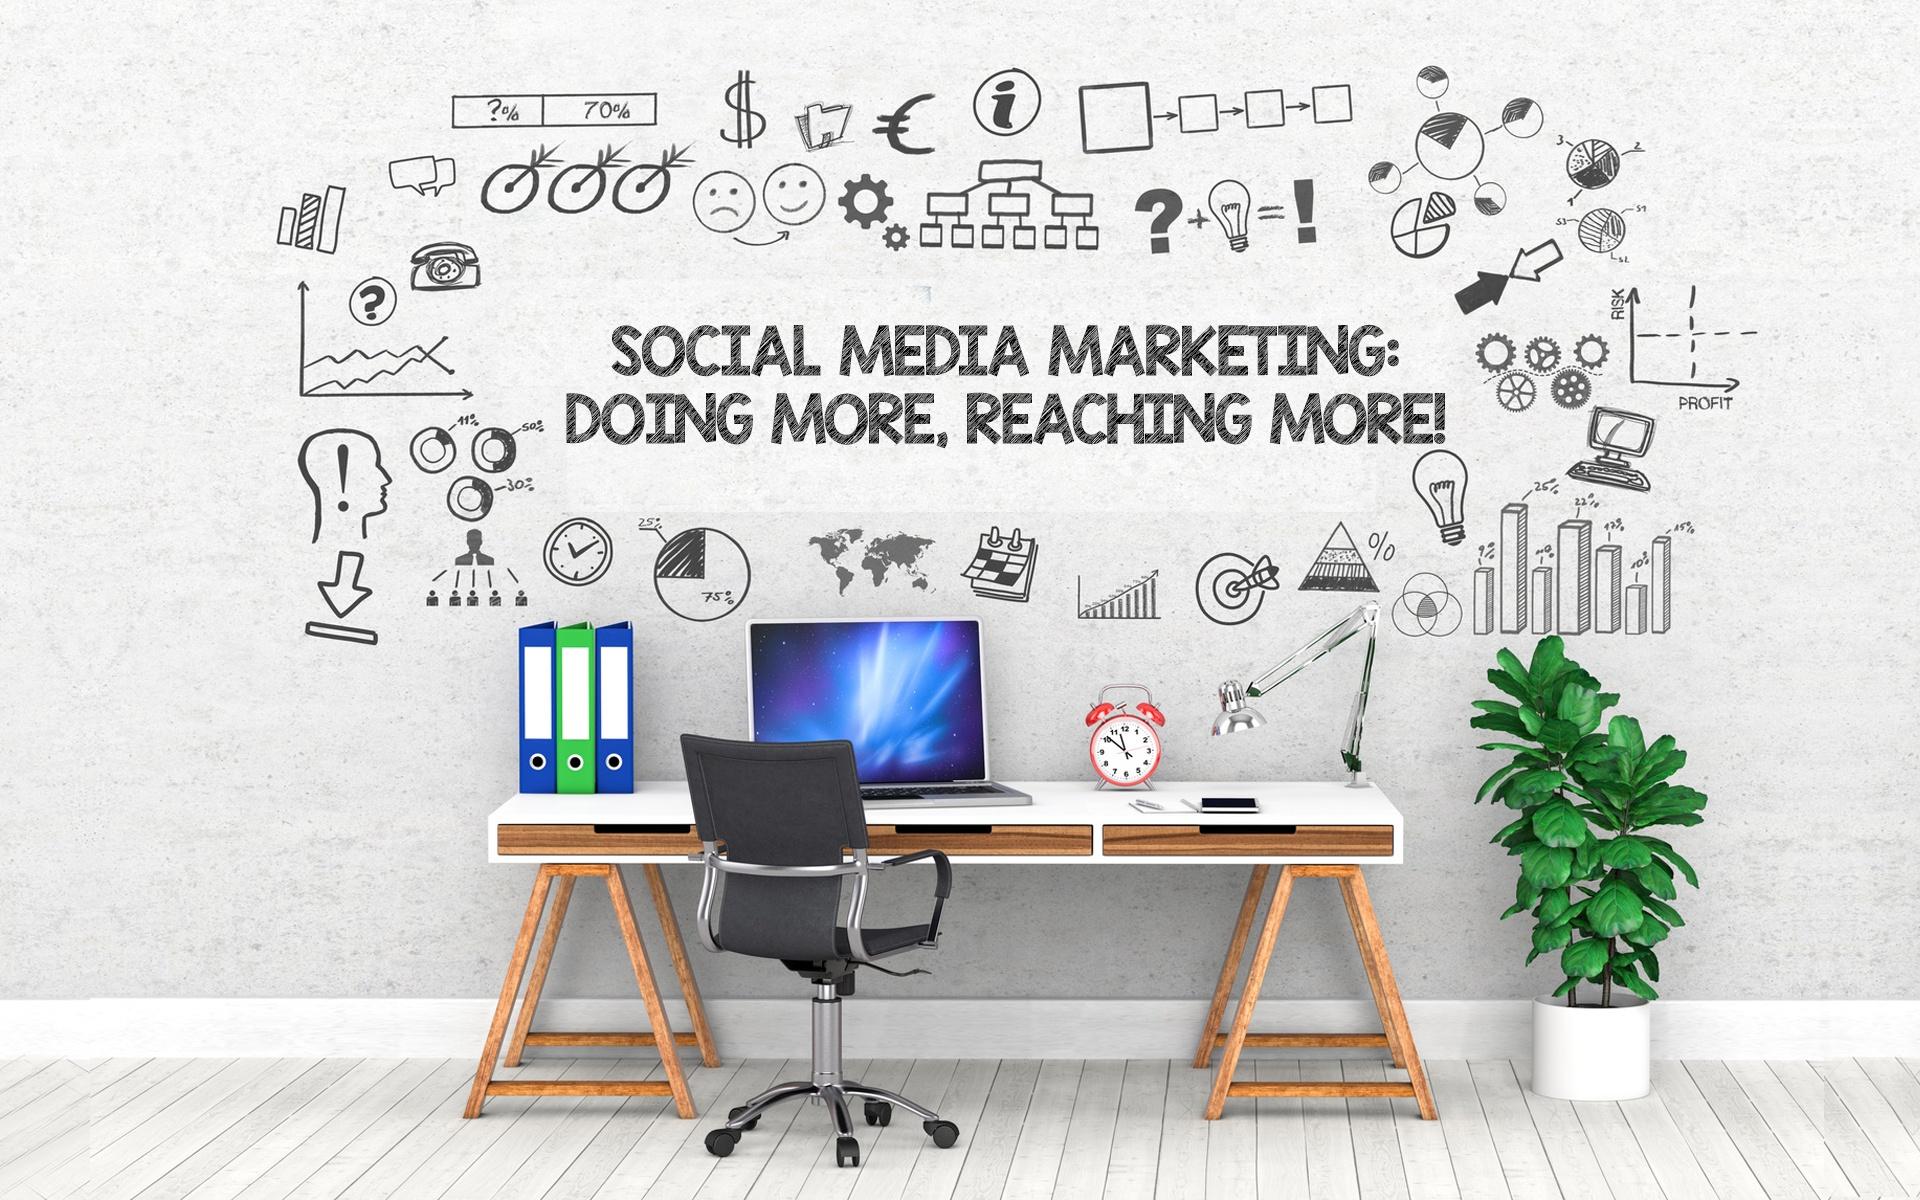 Social Media Marketing: Doing More, Reaching More!